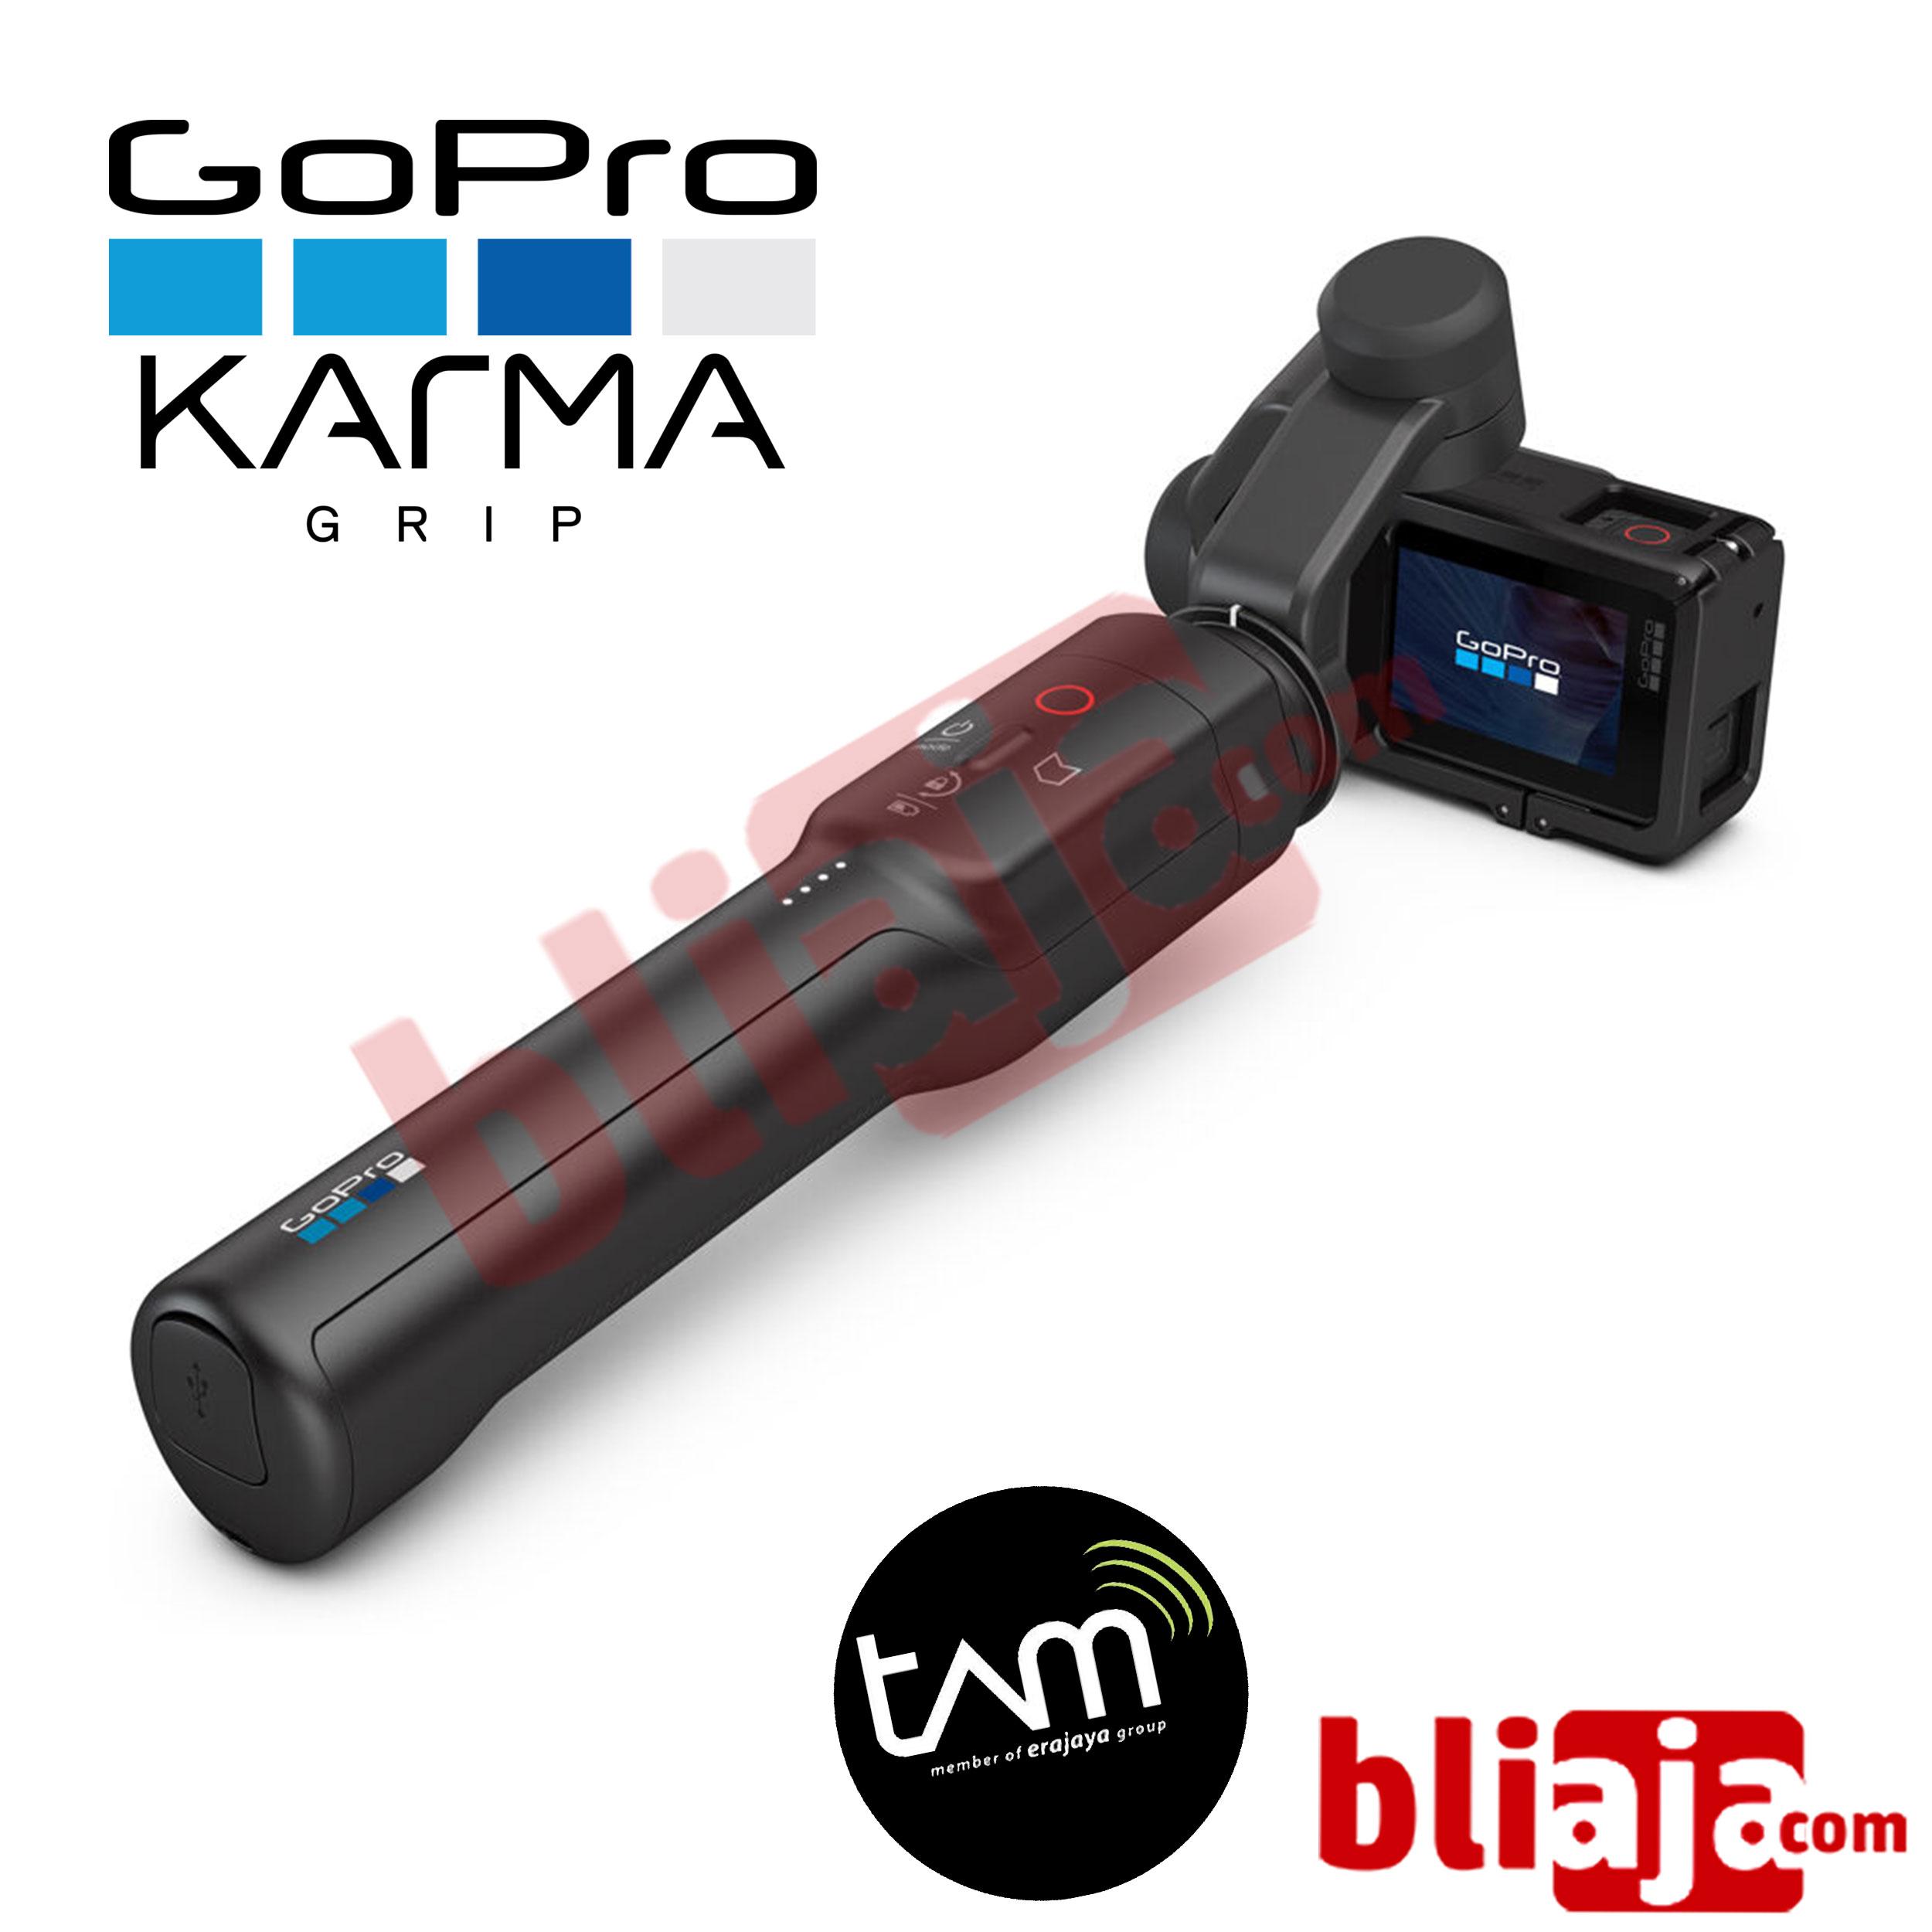 KARMA Grip for GoPro HERO5 Black (English/French/Italian)